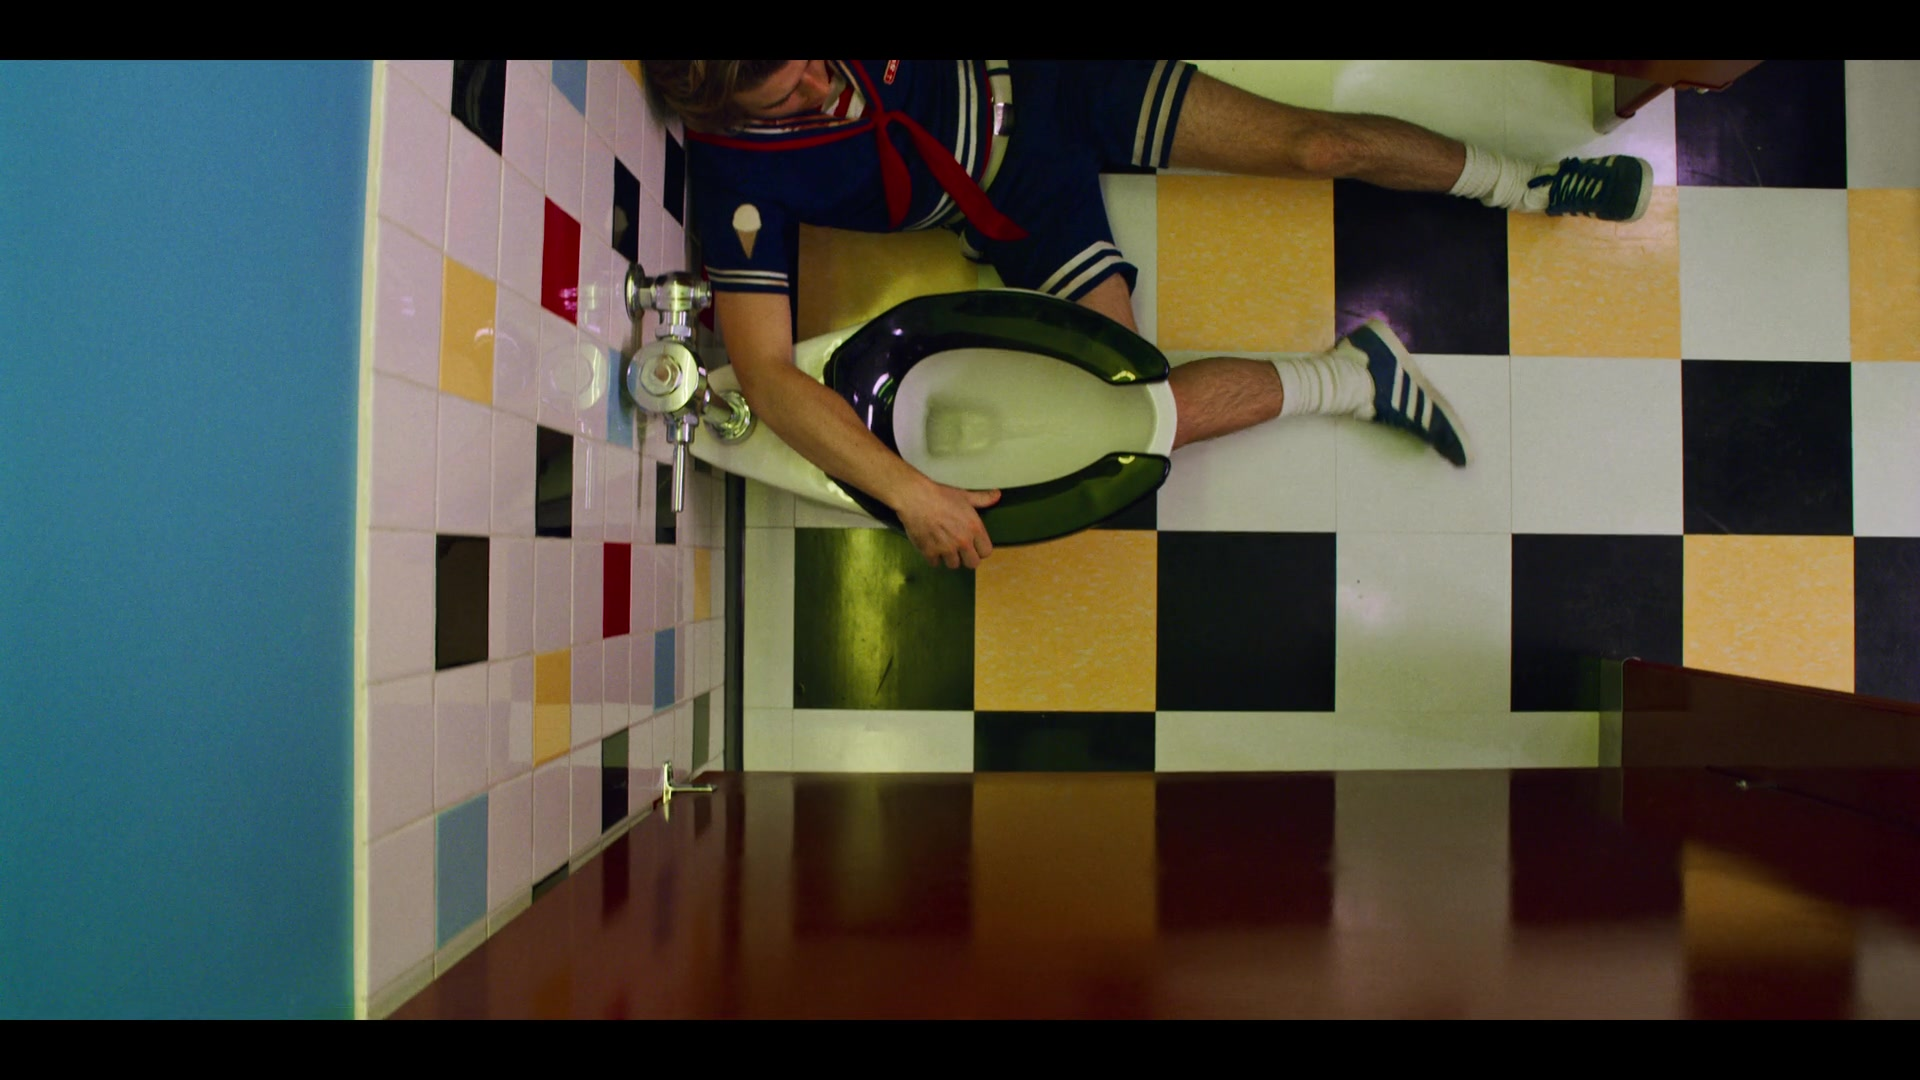 Bourgeon famélico Catarata  Adidas Shoes Worn By Joe Keery As Steve Harrington In Stranger Things -  Season 3, Episode 7,